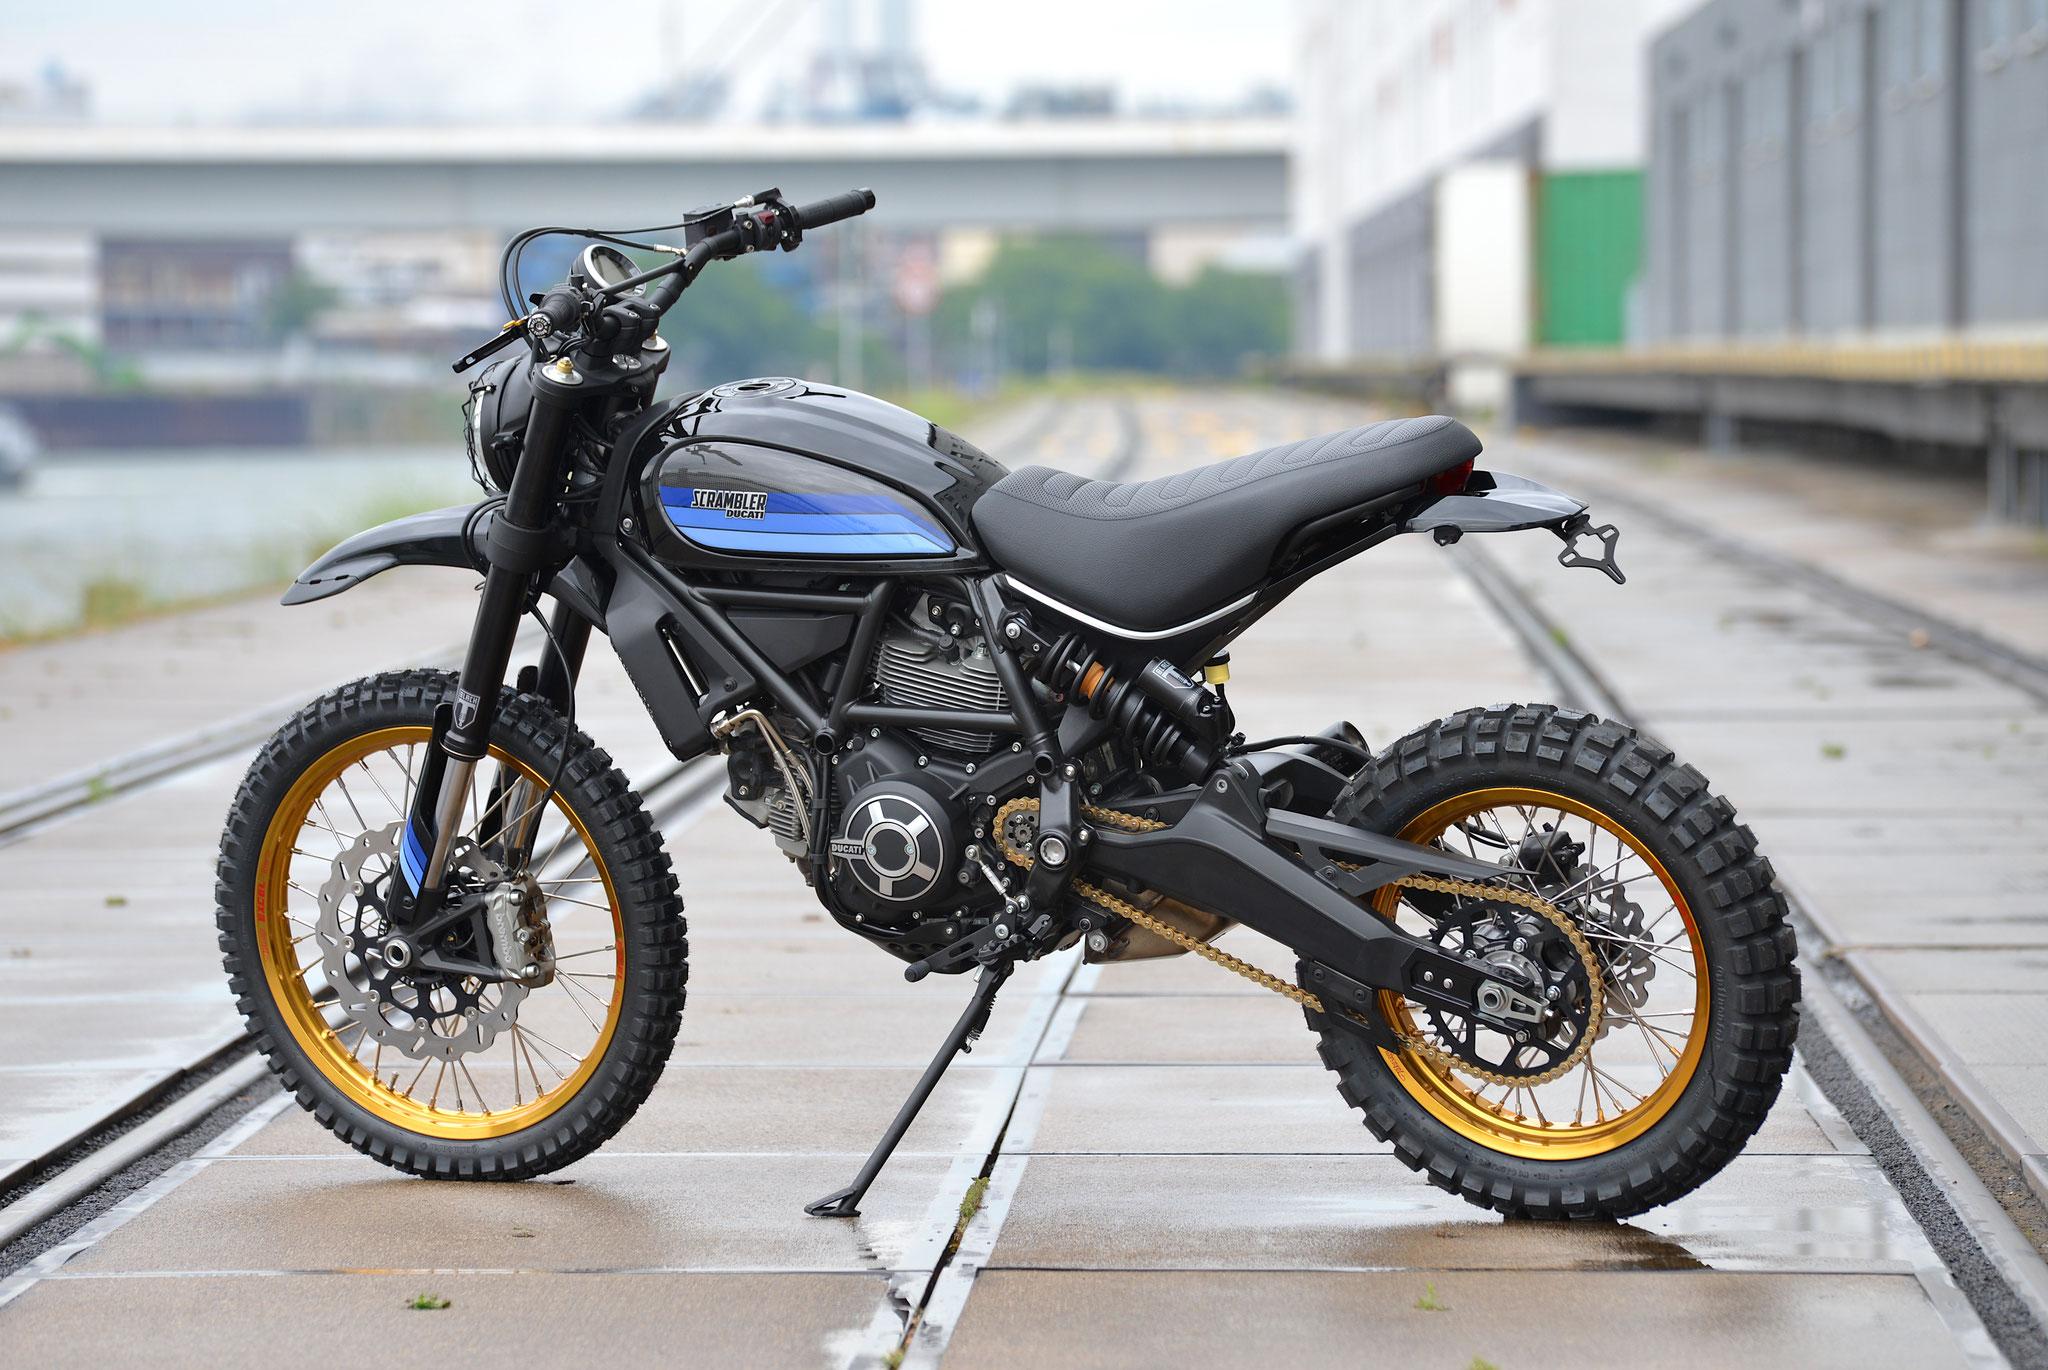 Ducati Scrambler Desert Sled Fasthouse. Nuova Limited